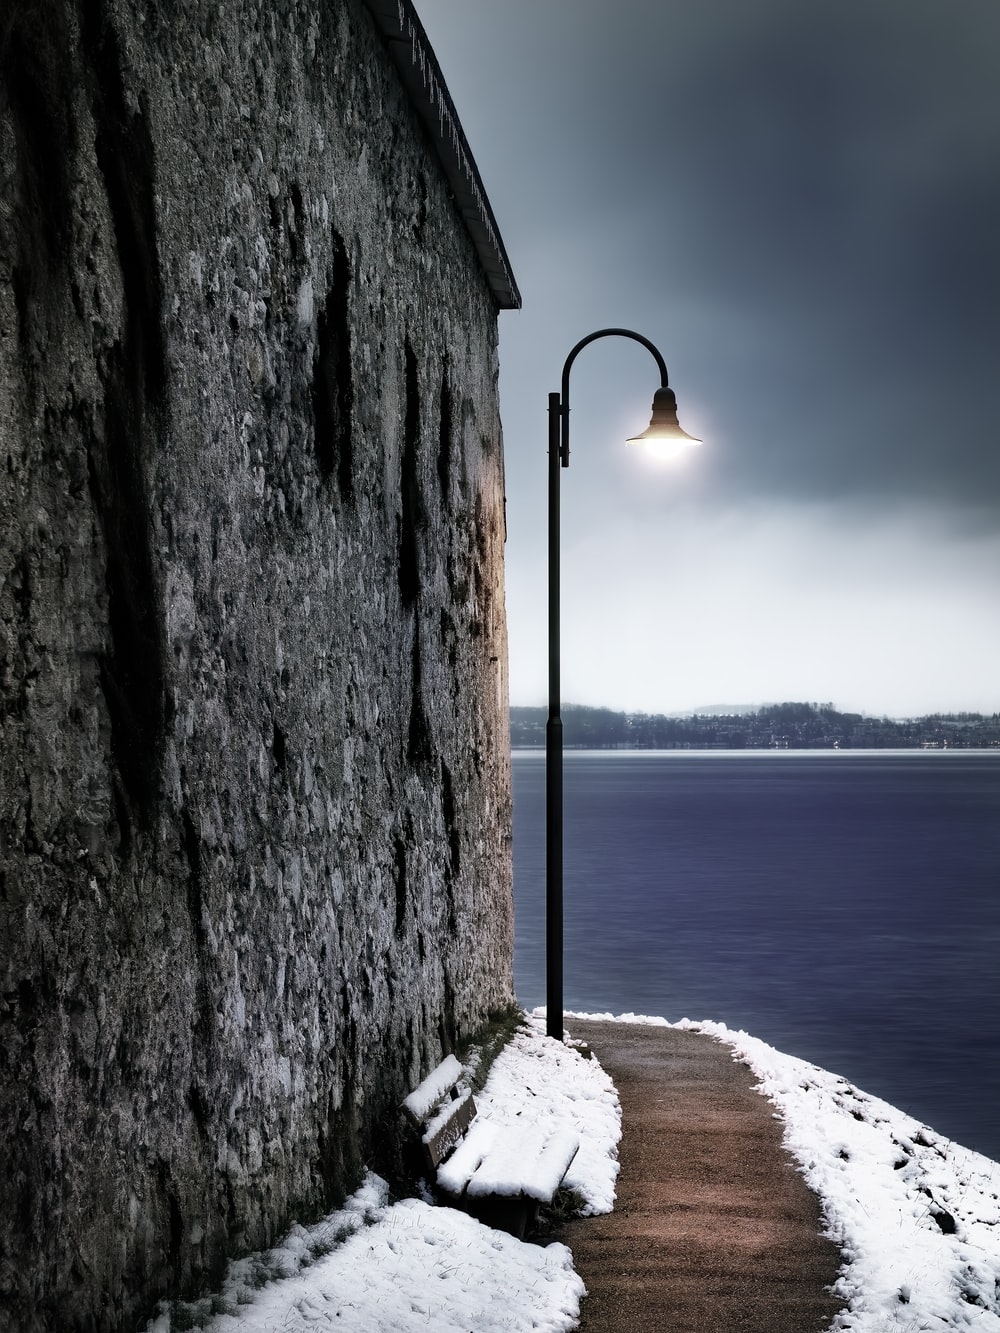 black street lamp near body of water during daytime